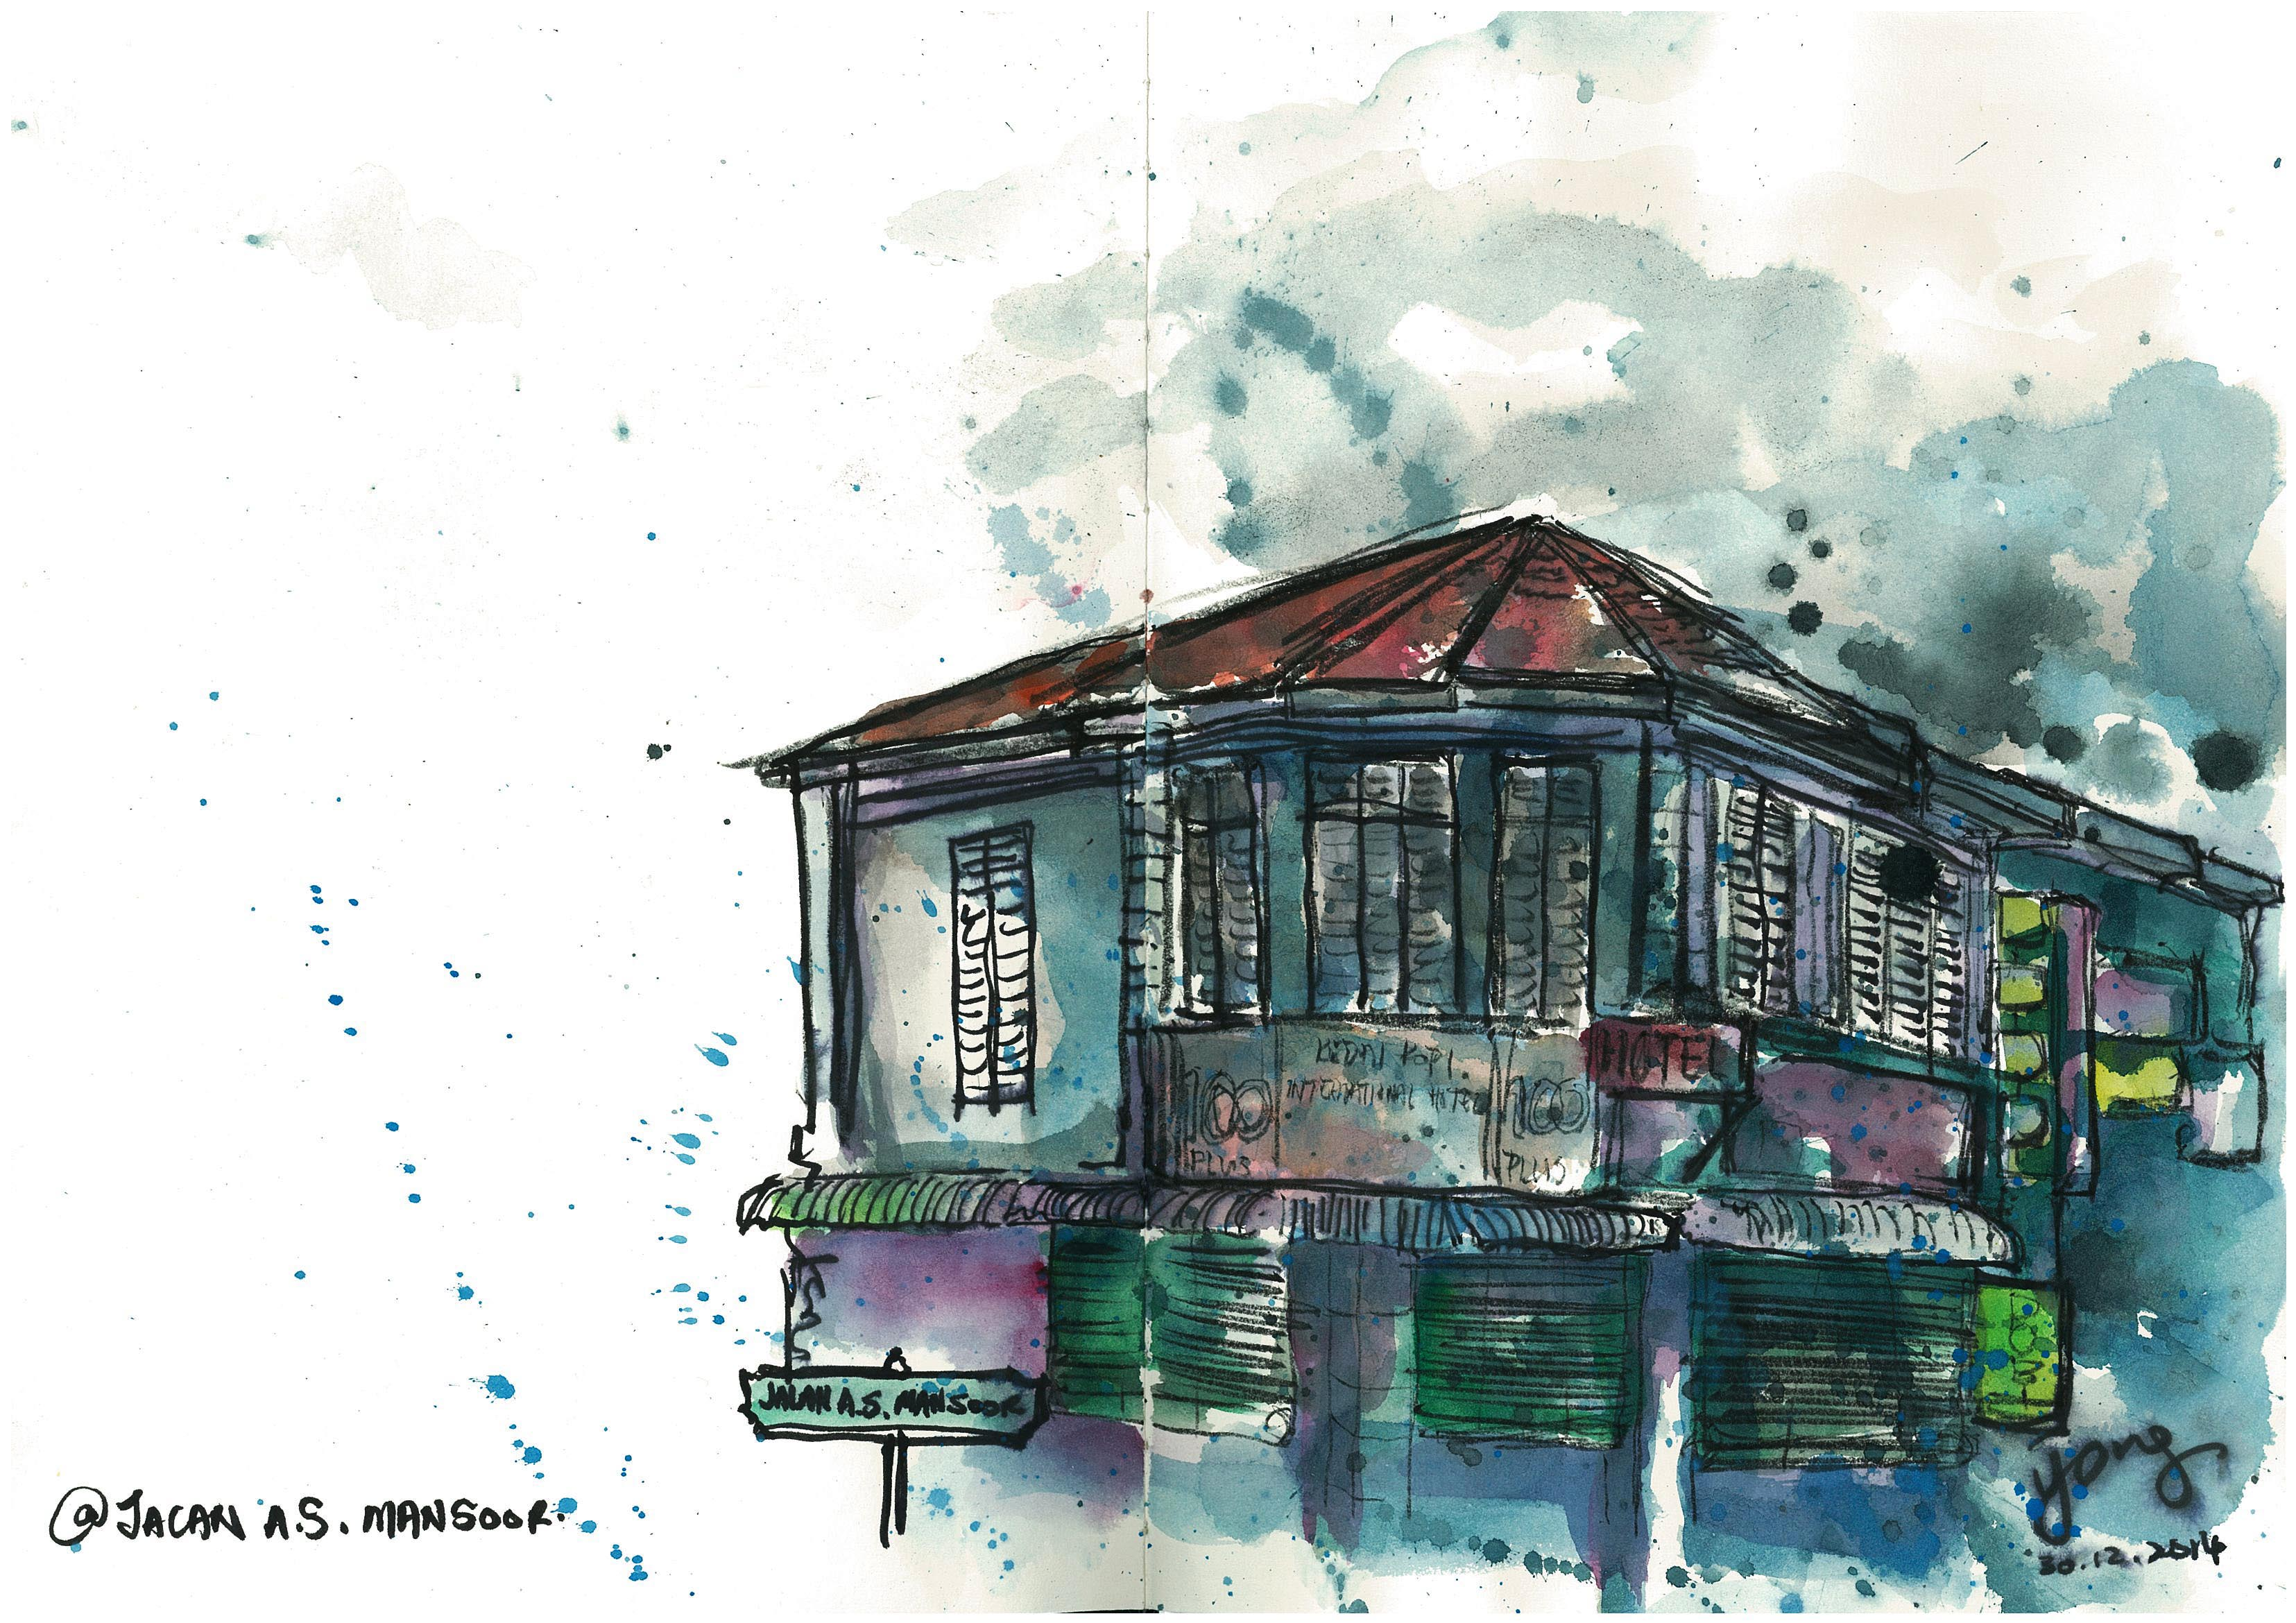 sketch@jalan a.s. mansoor